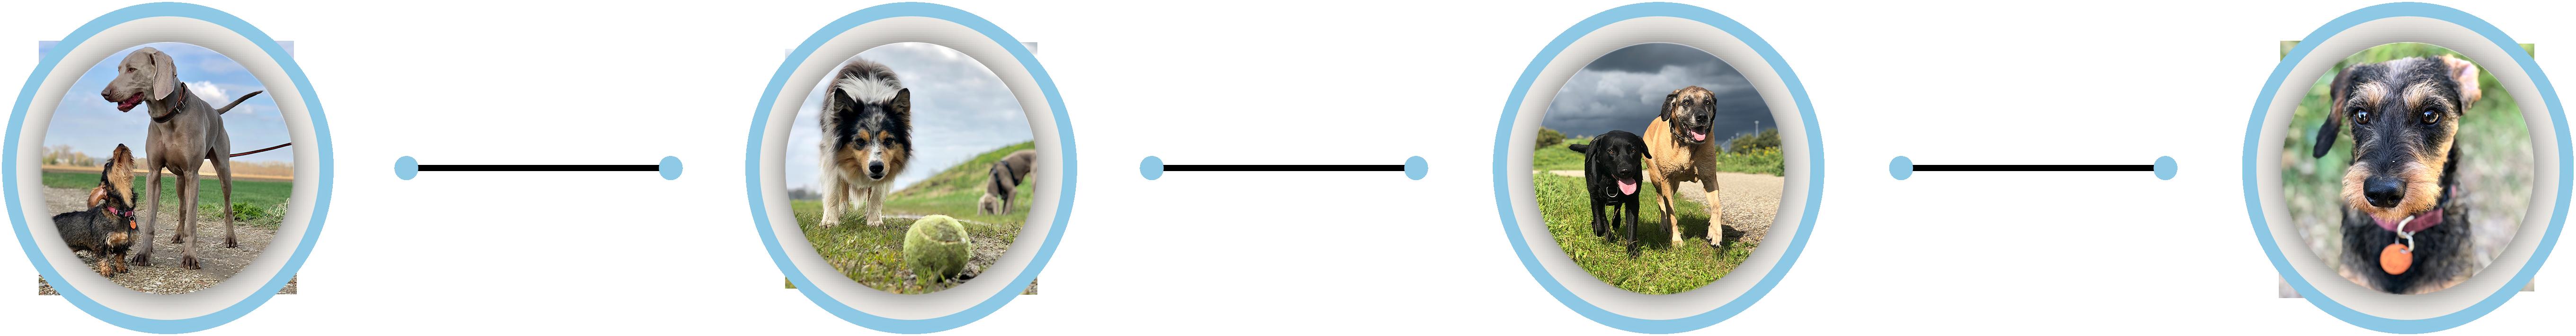 Schippers Hondenservice highlights